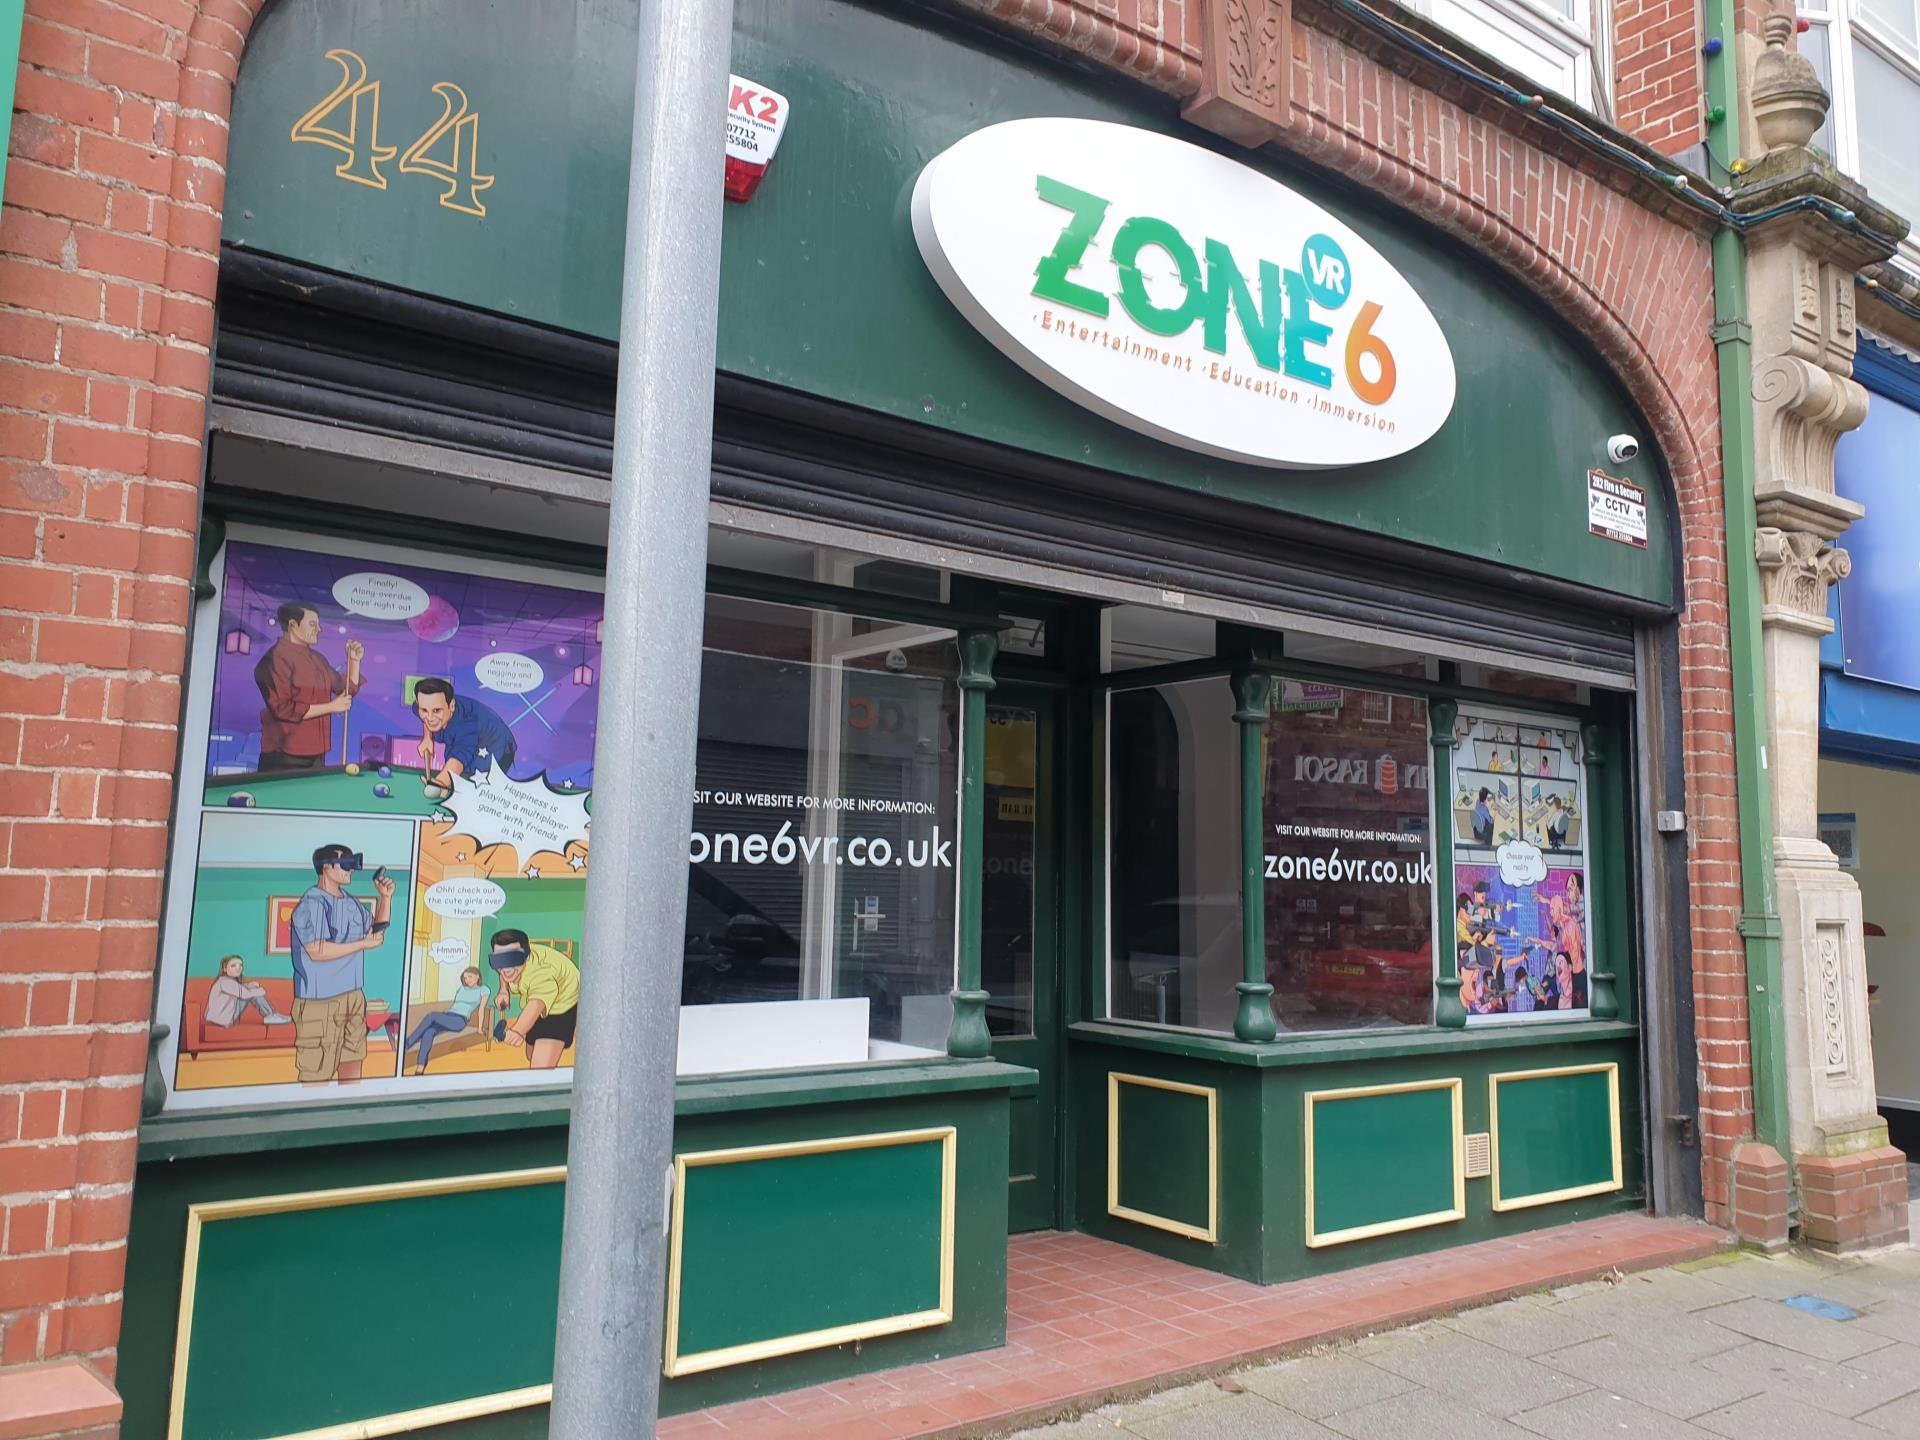 Zone 6 VR